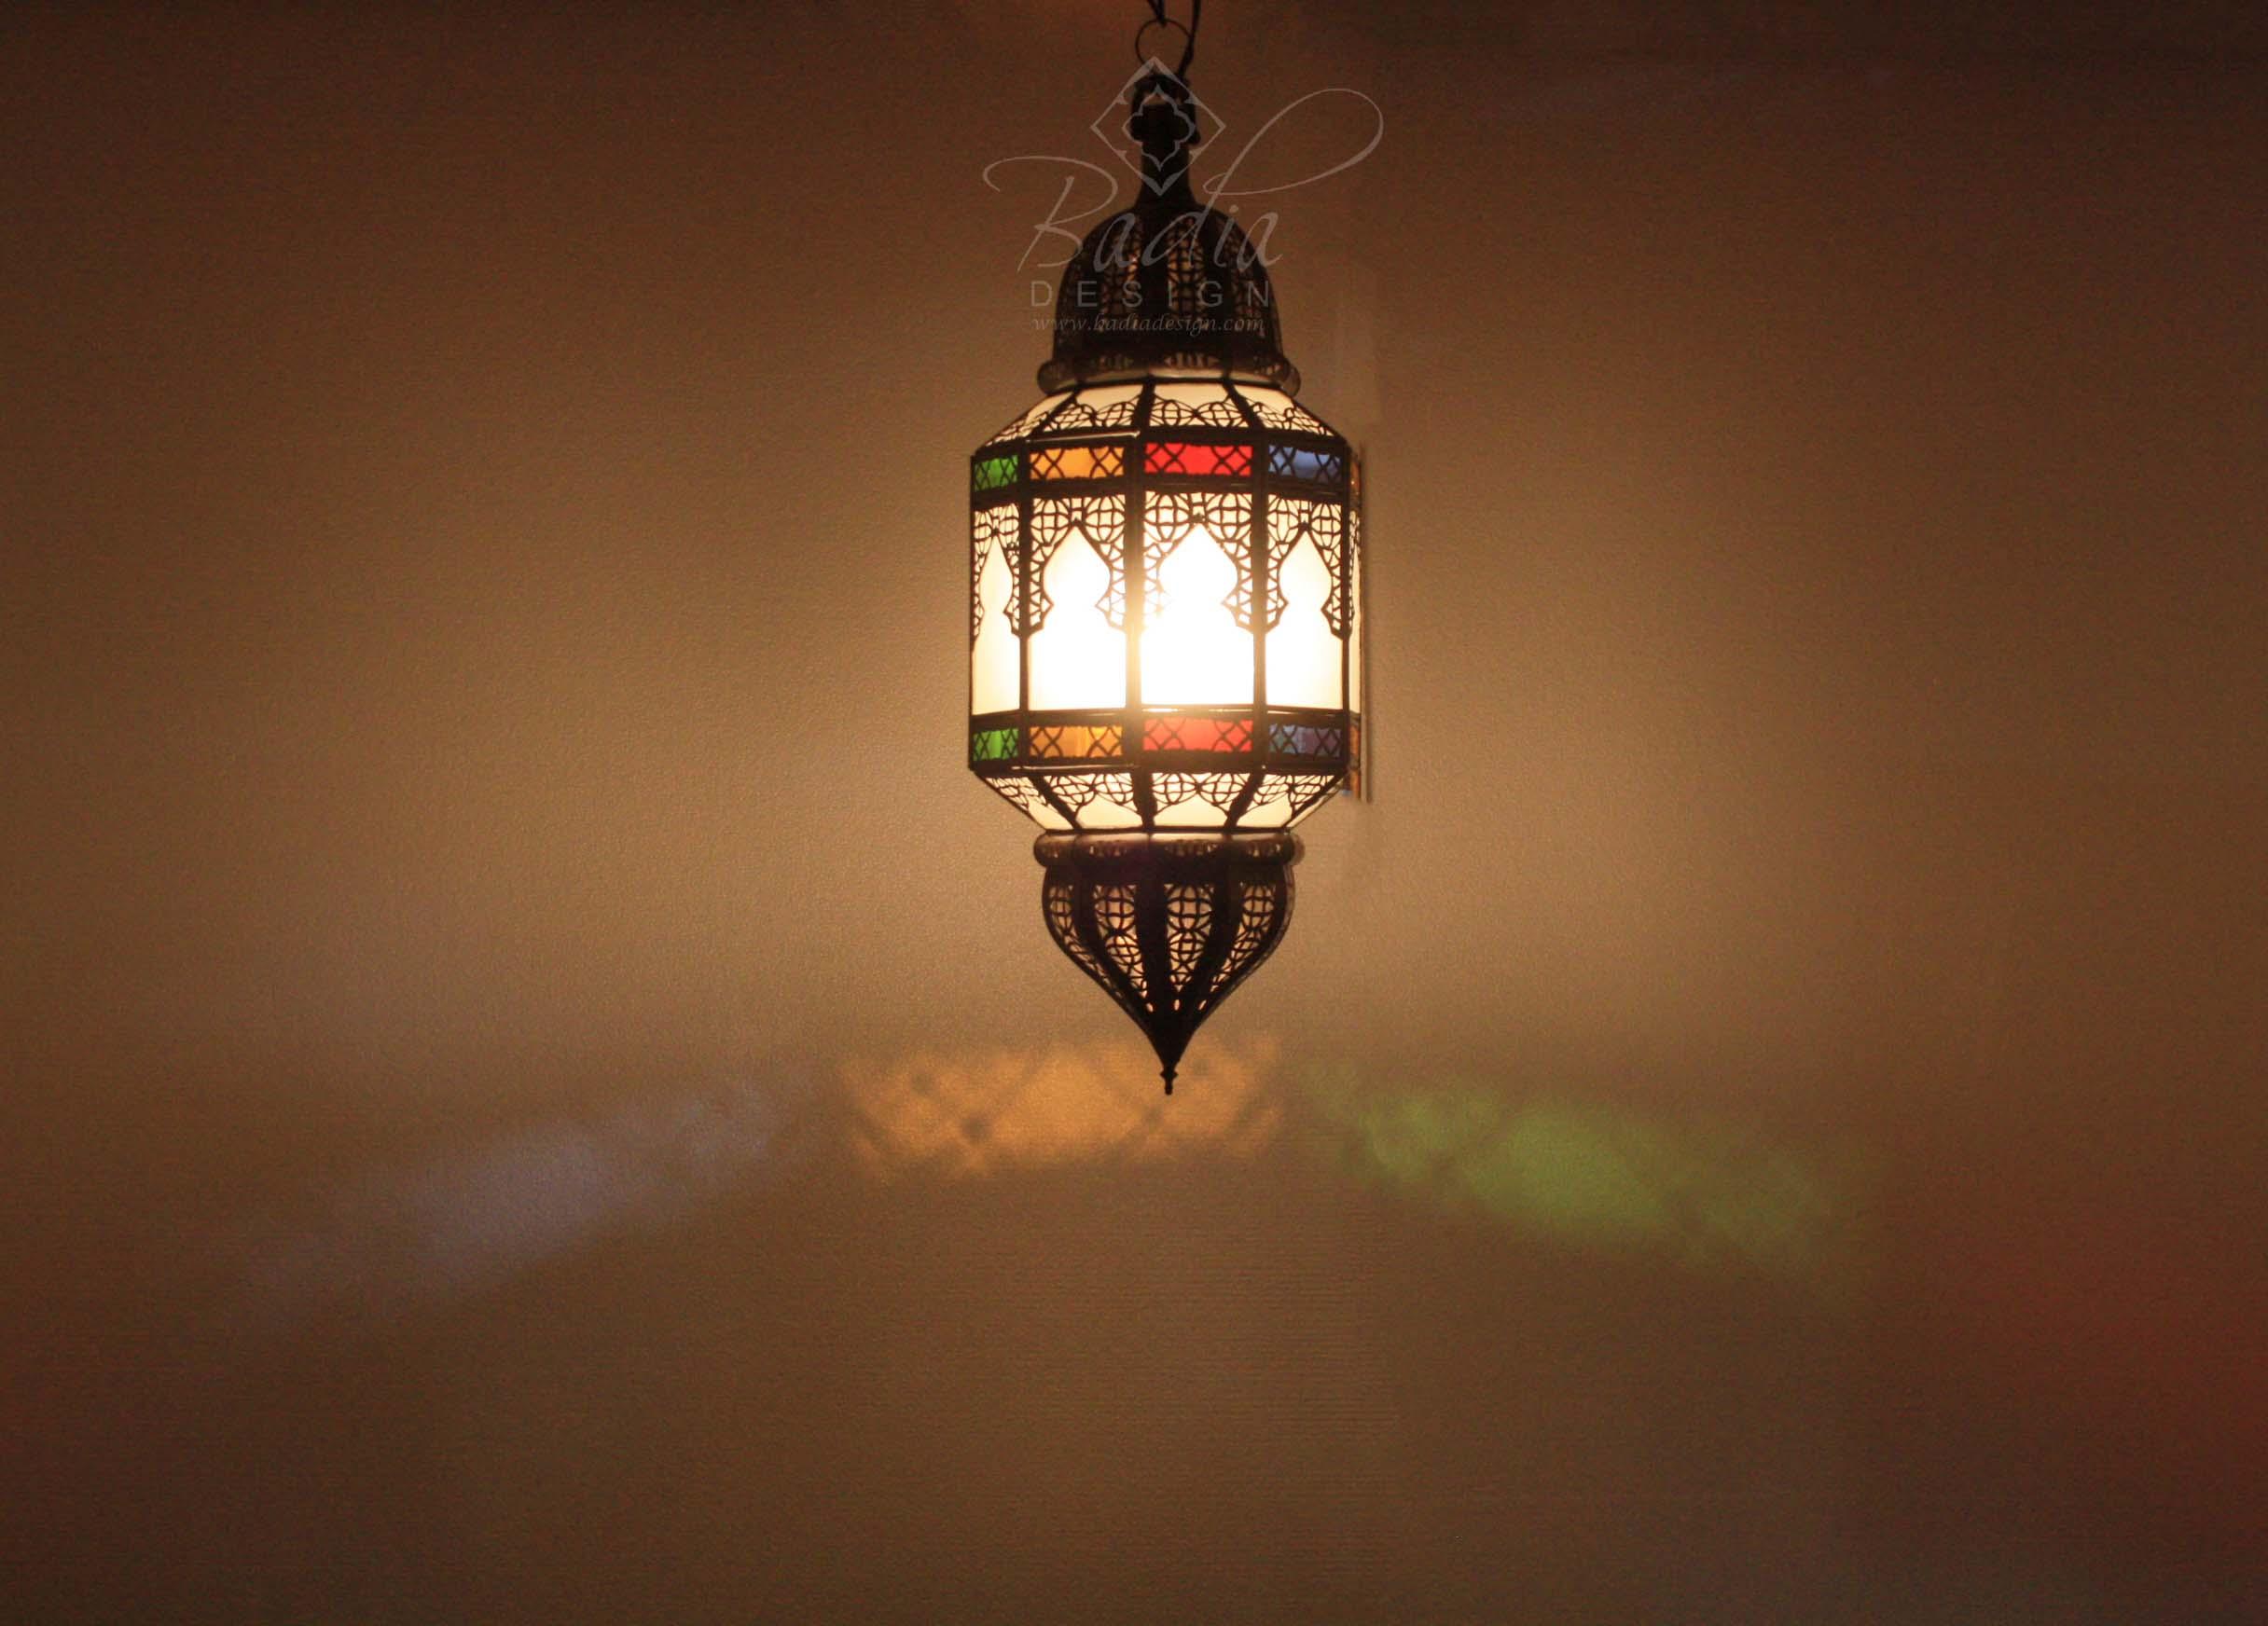 moroccan-hanging-multi-color-glass-lantern-lig387-1.jpg